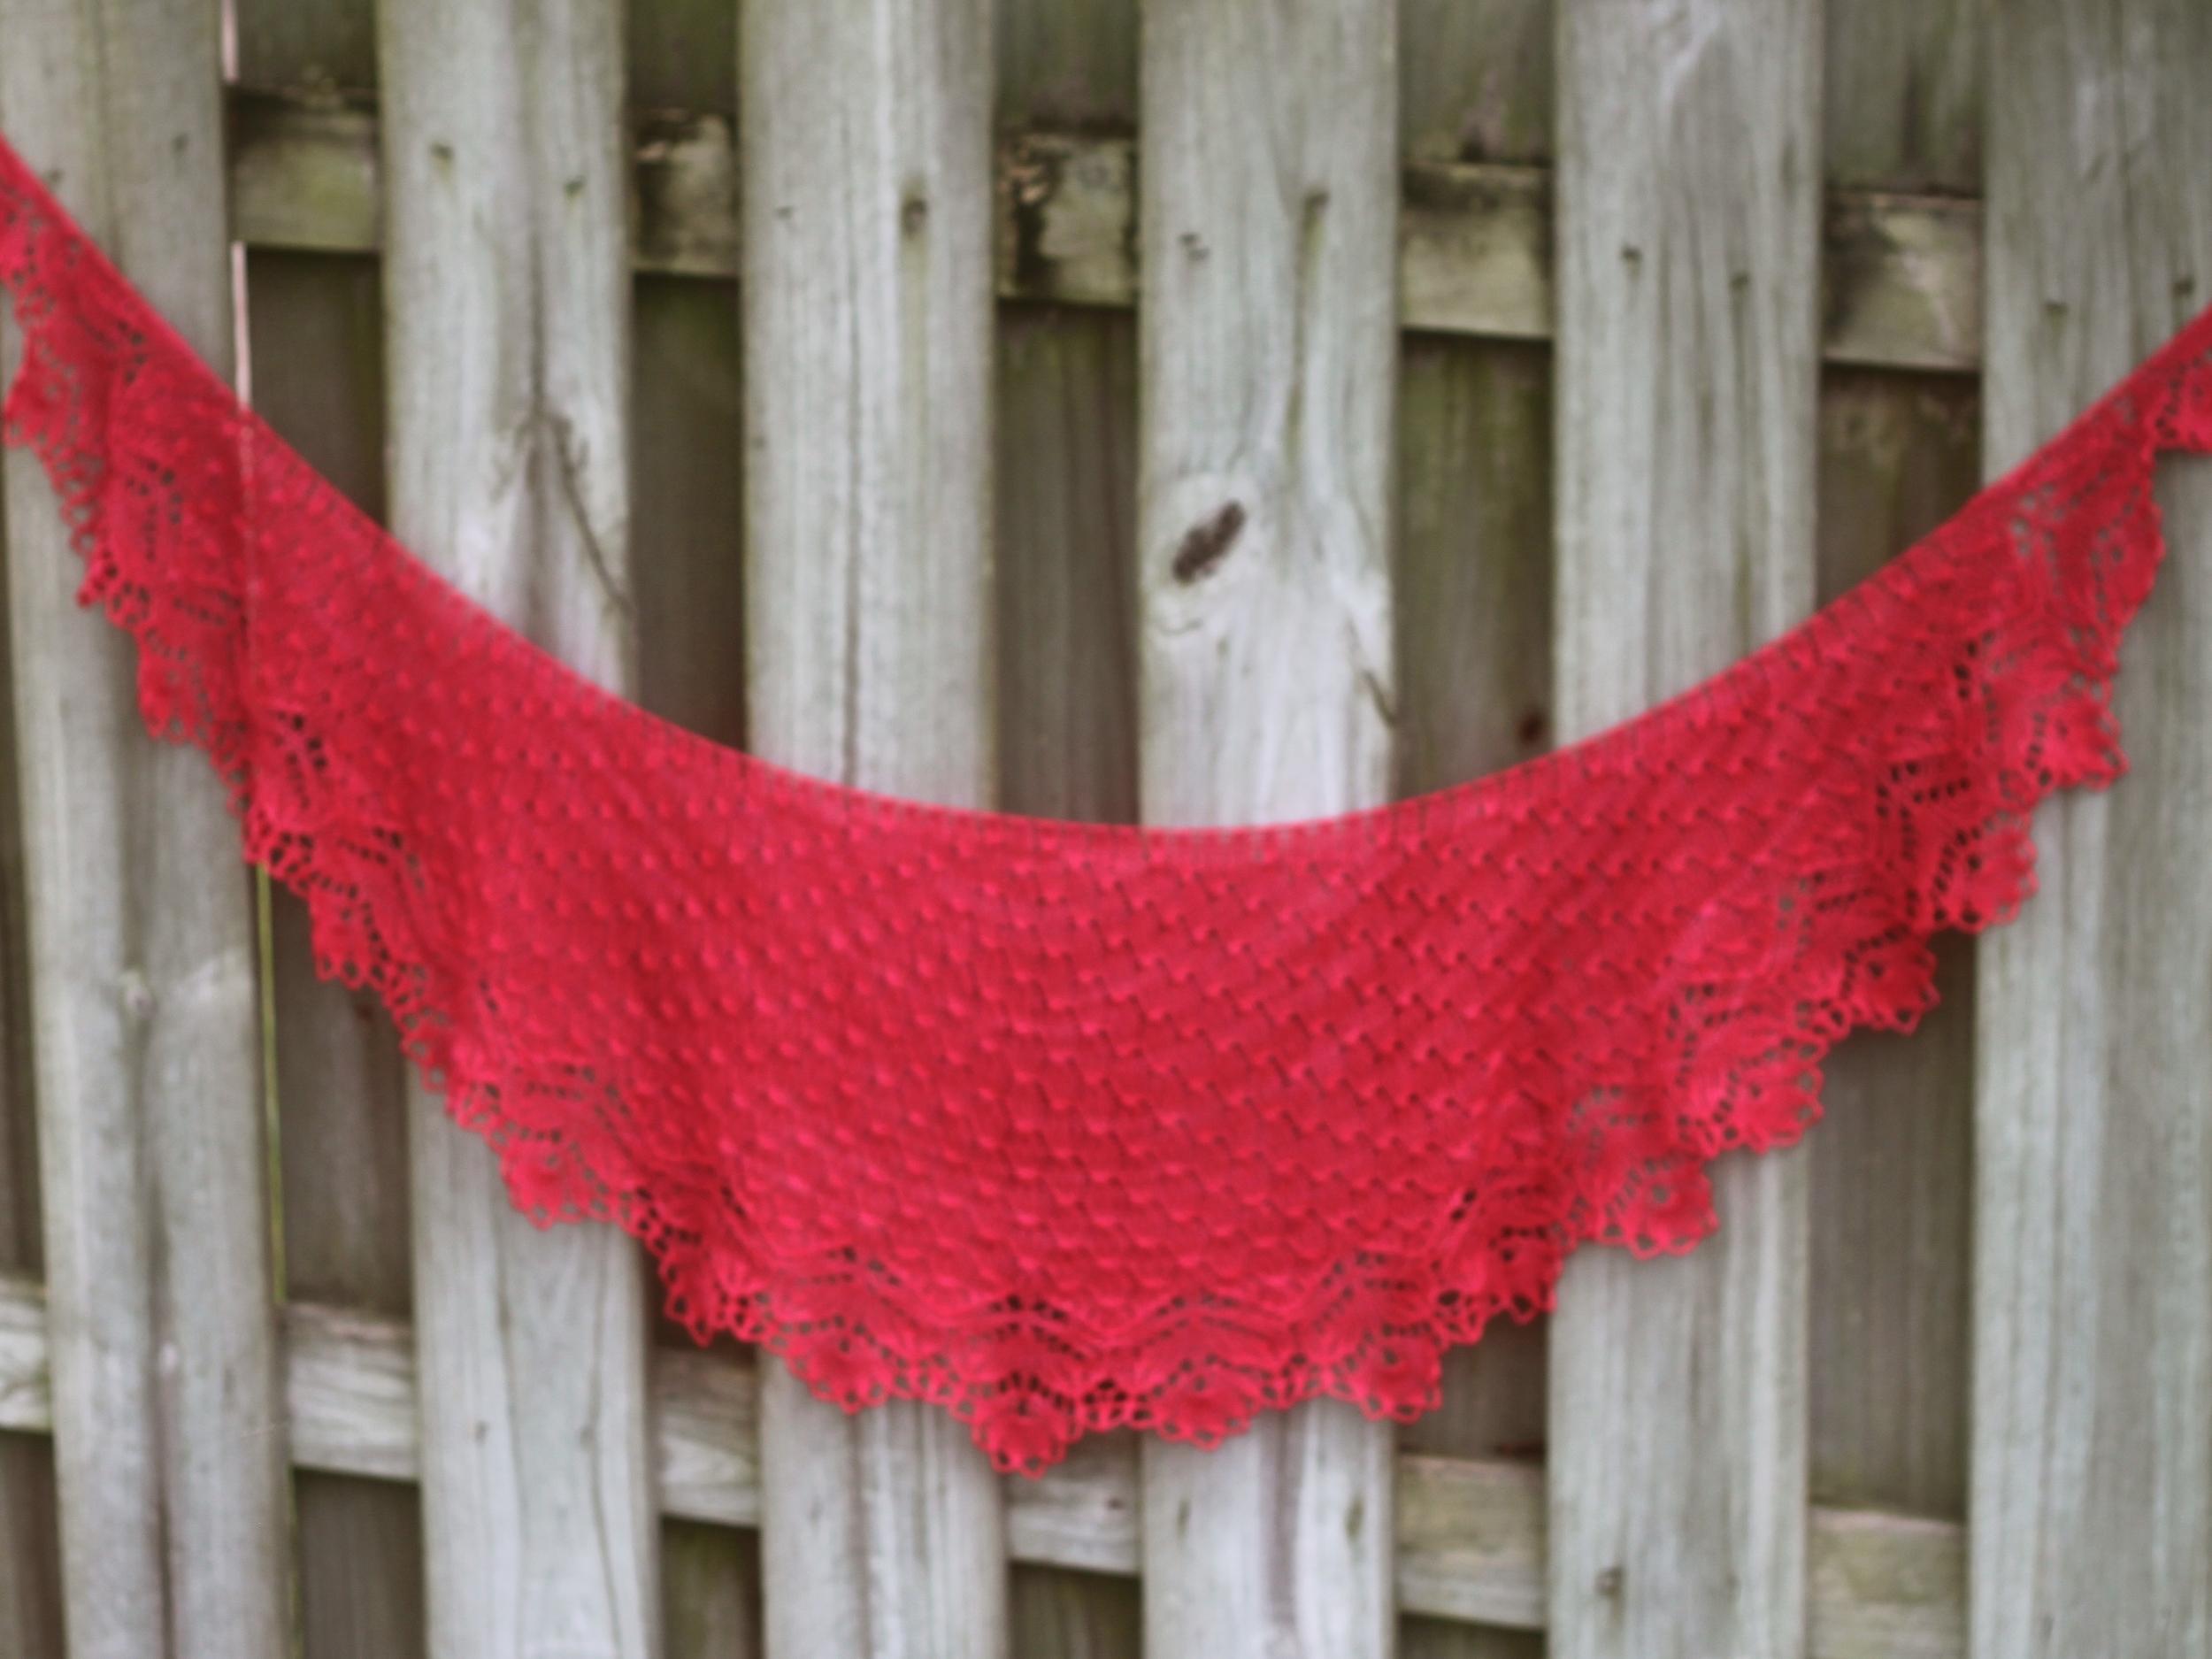 evanthe-picnicknits-knitting-pattern